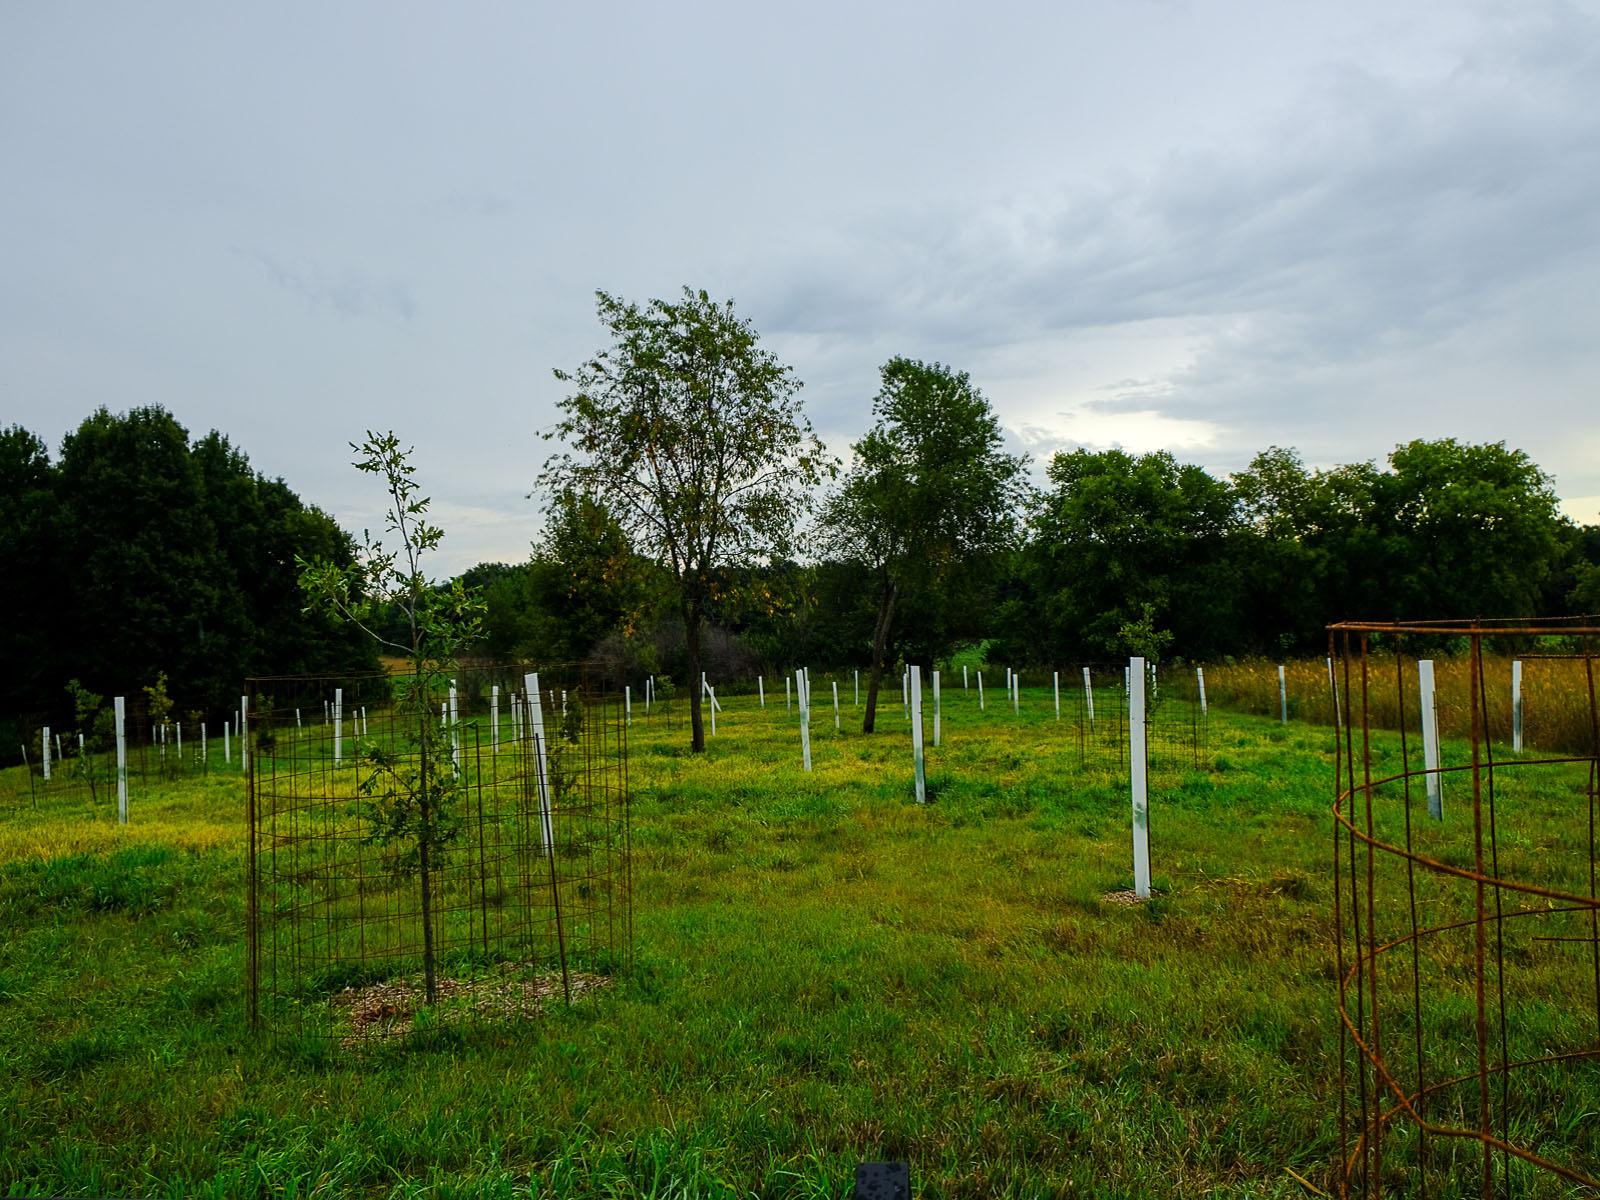 <div class='slider_caption'>                                                      <h1>Trees of the Arboretum</h1>                                                      <a class='slider-readmore' href=''>                                                                                                           </a>                                                      </div>